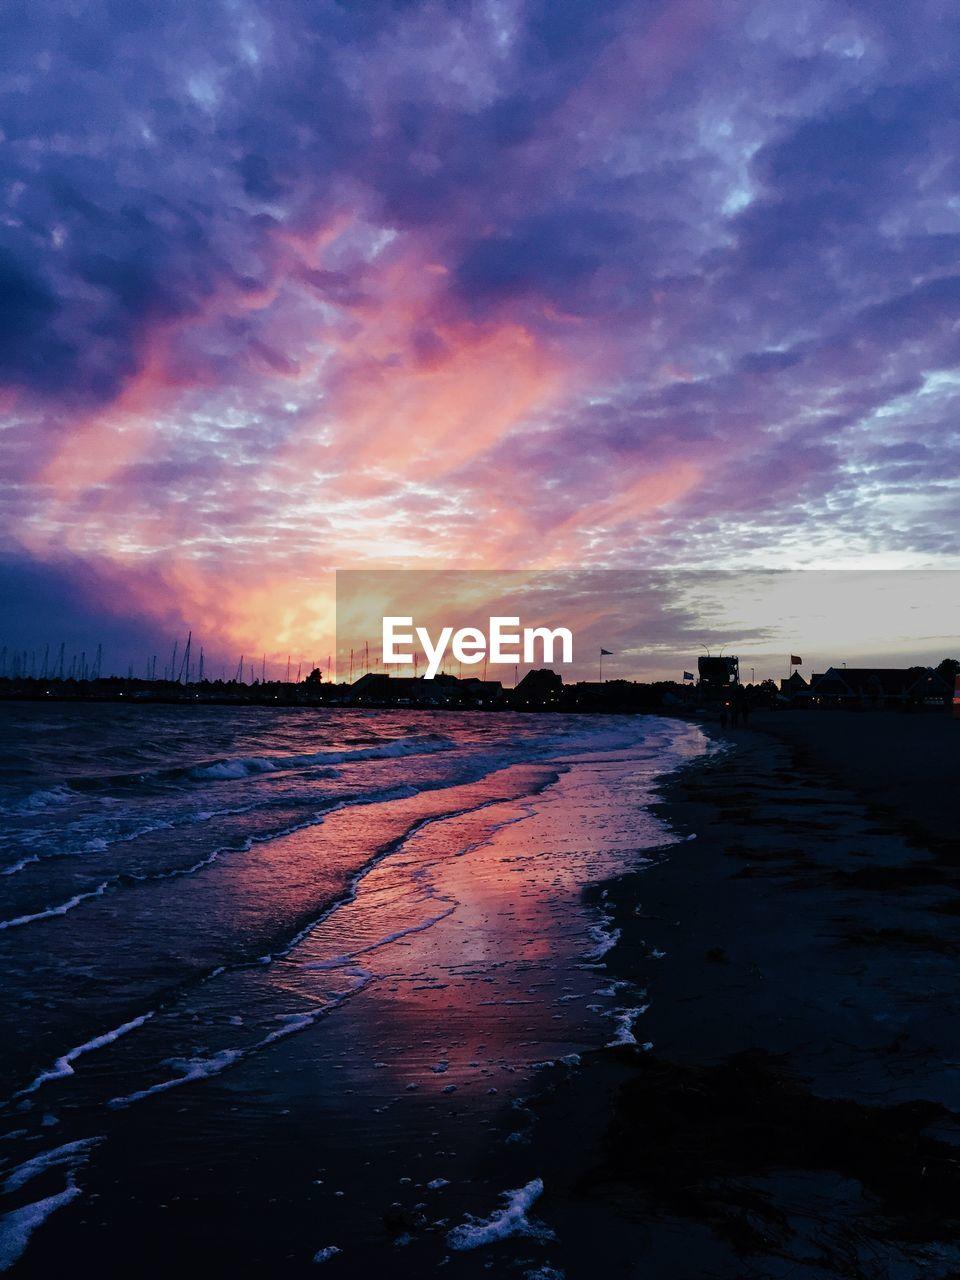 sky, cloud - sky, sunset, water, scenics - nature, tranquil scene, tranquility, beauty in nature, nature, sea, no people, beach, land, dramatic sky, non-urban scene, outdoors, idyllic, silhouette